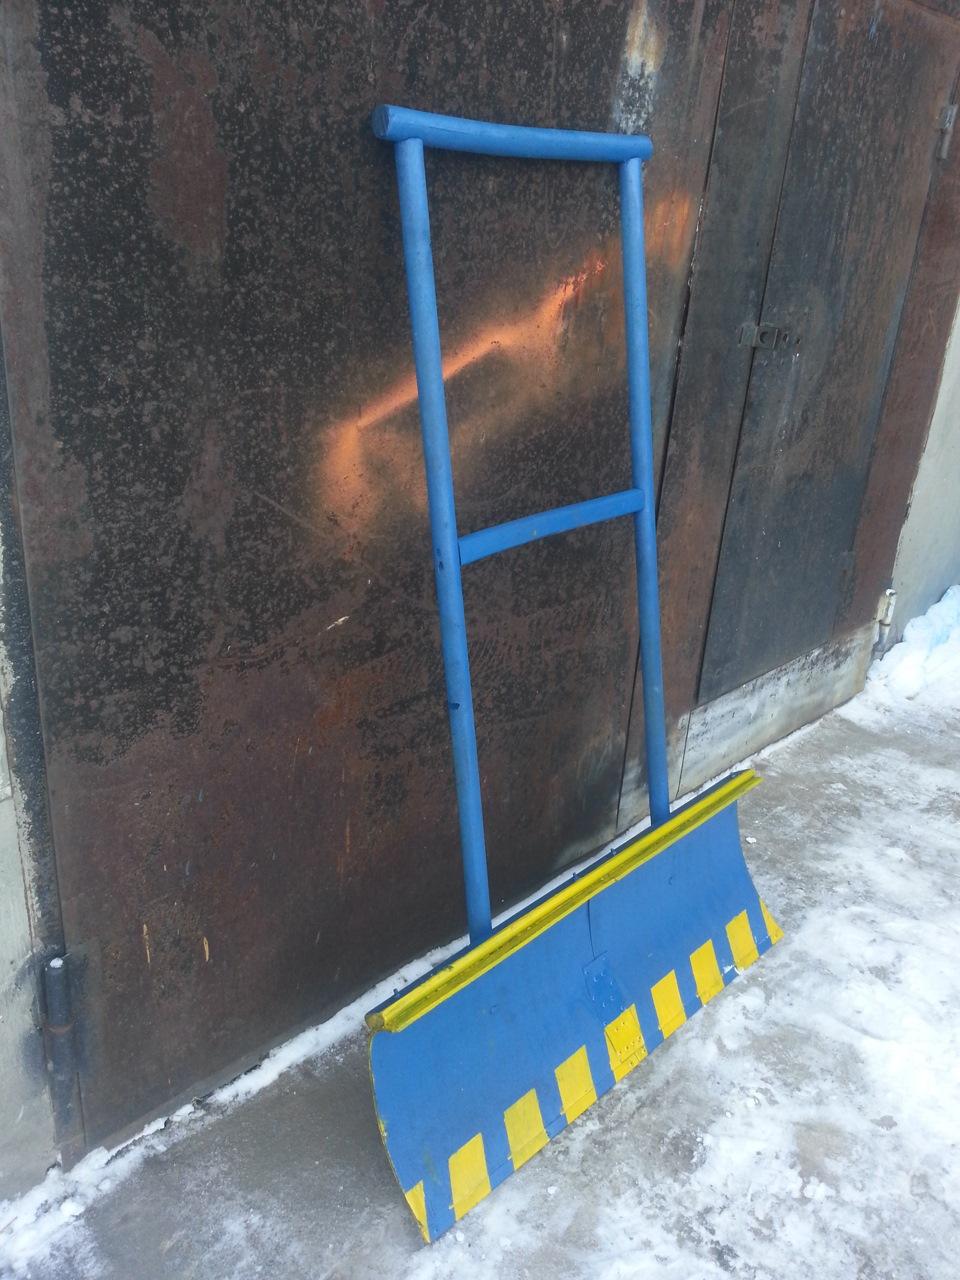 Лопата для уборки снега, скребки для быстрой чистки территории 48